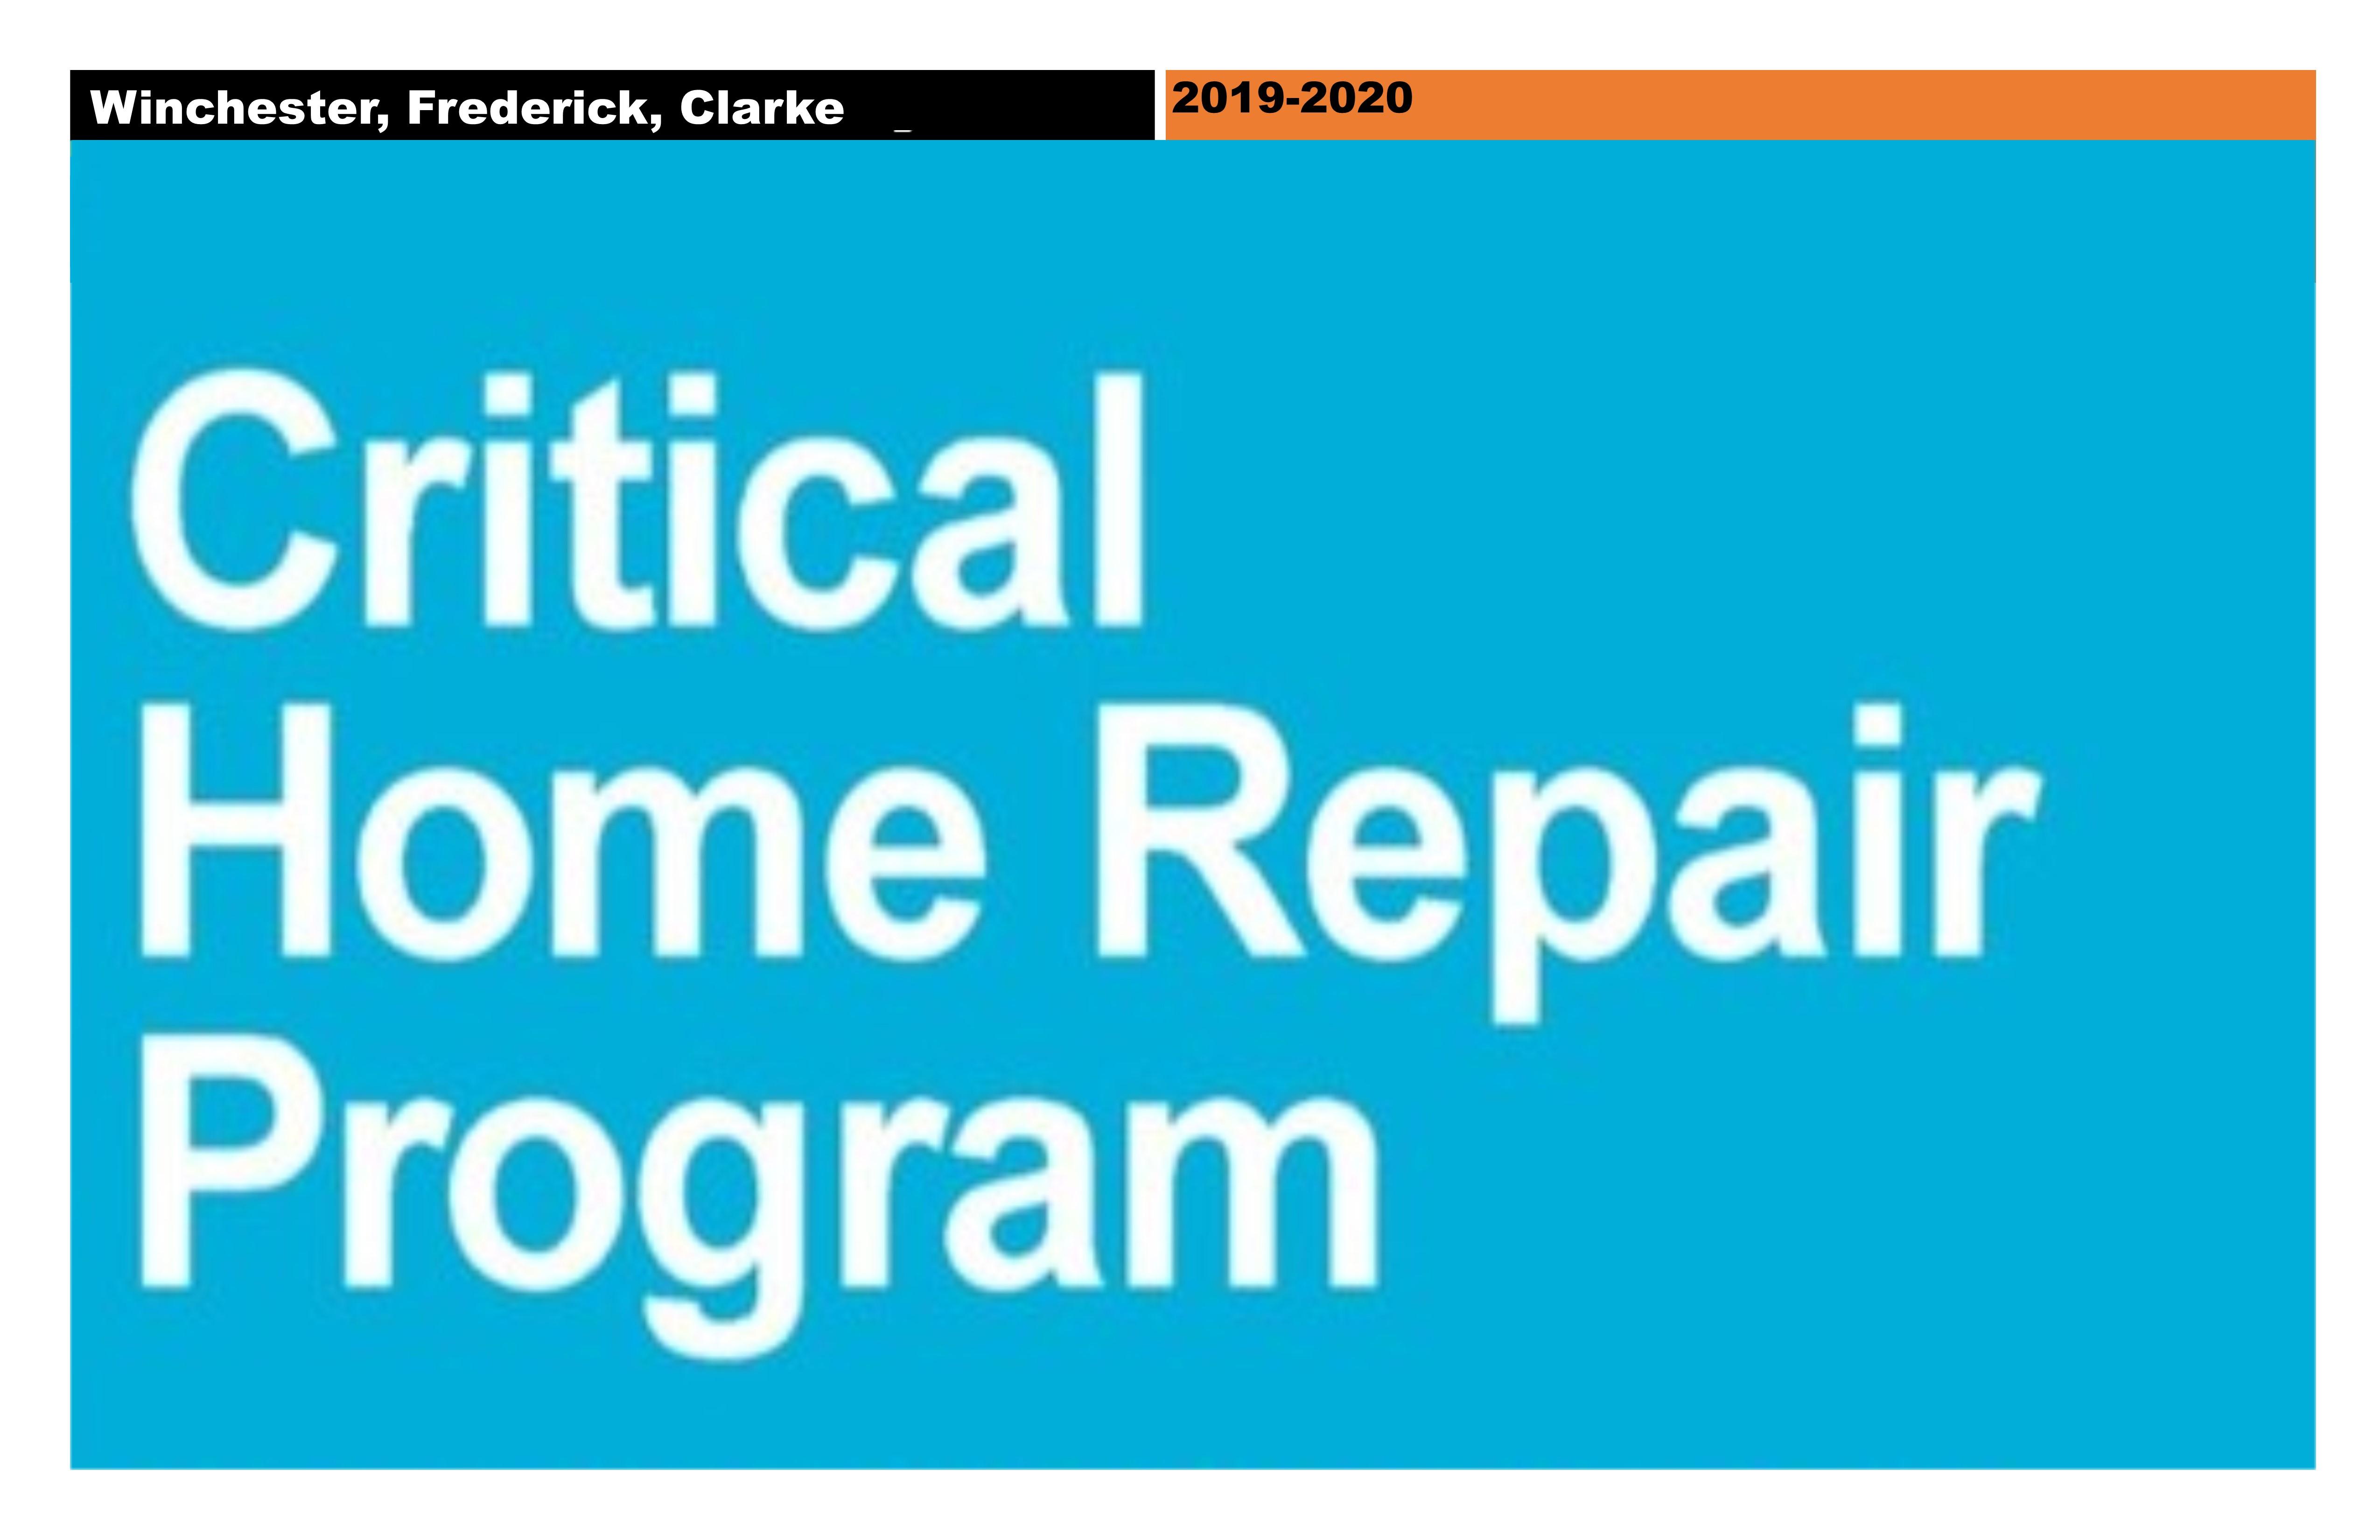 Critical Home Repair Program | Winchester, Frederick and Clarke